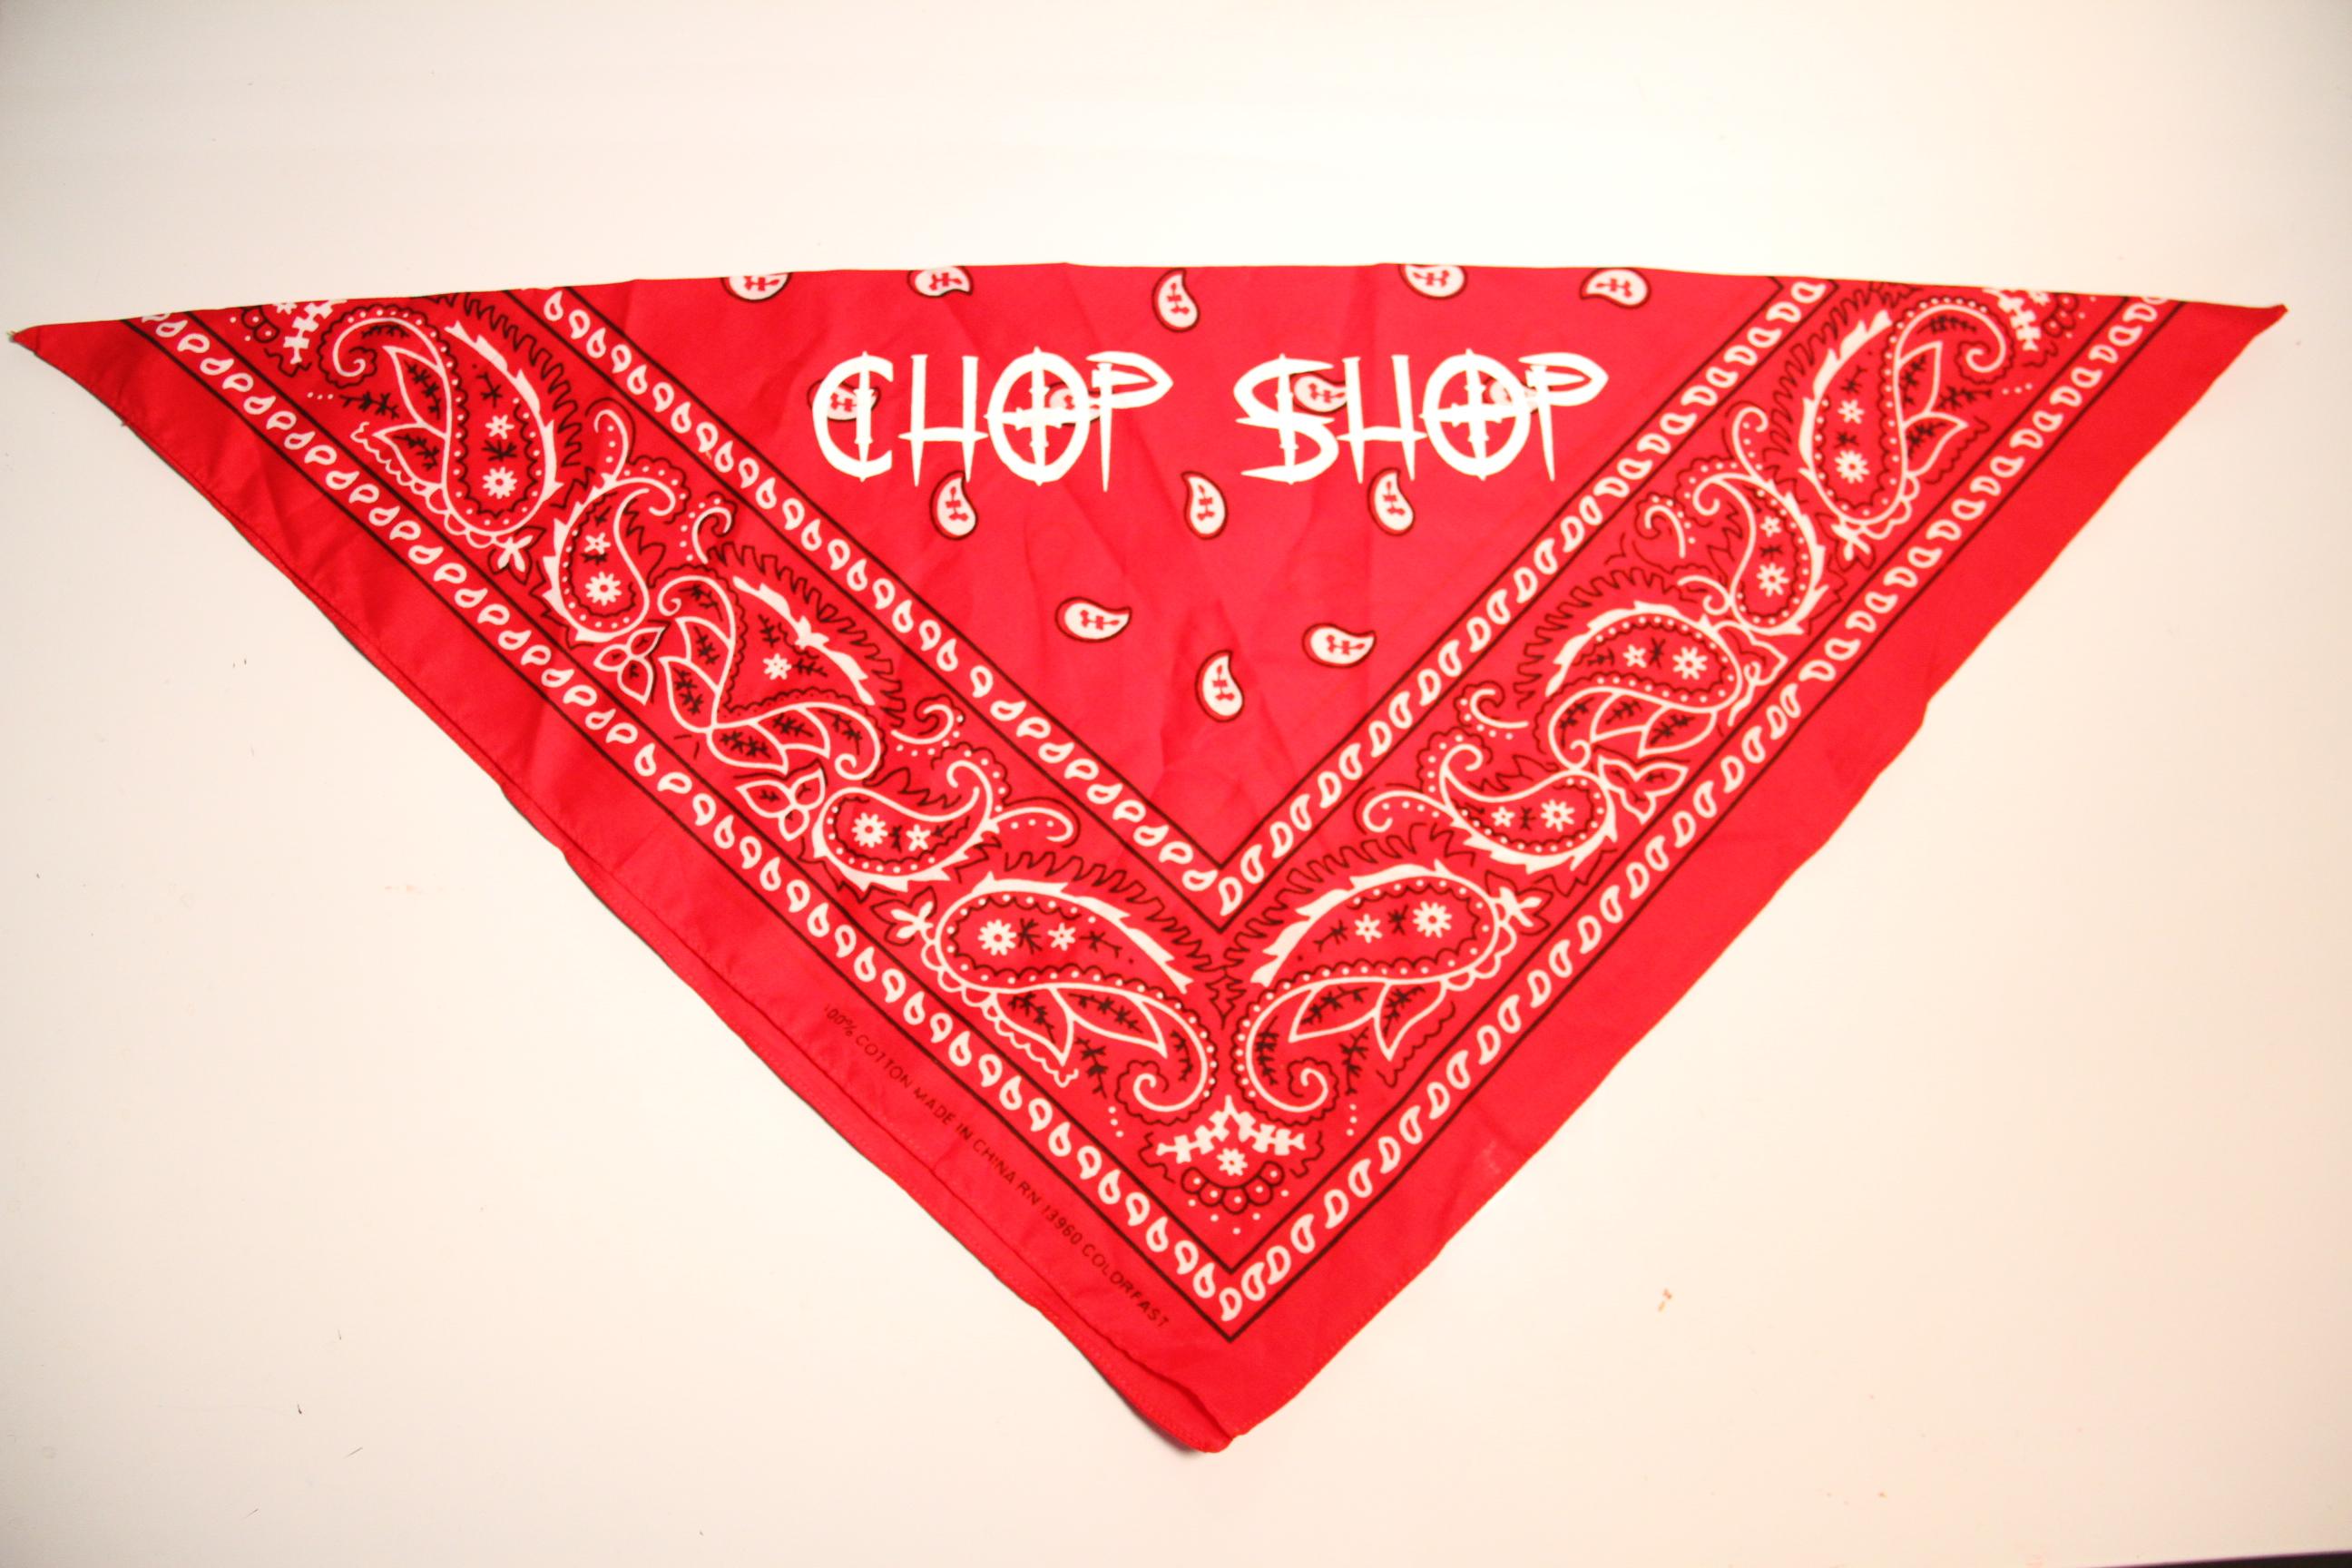 chop shop bandana.JPG